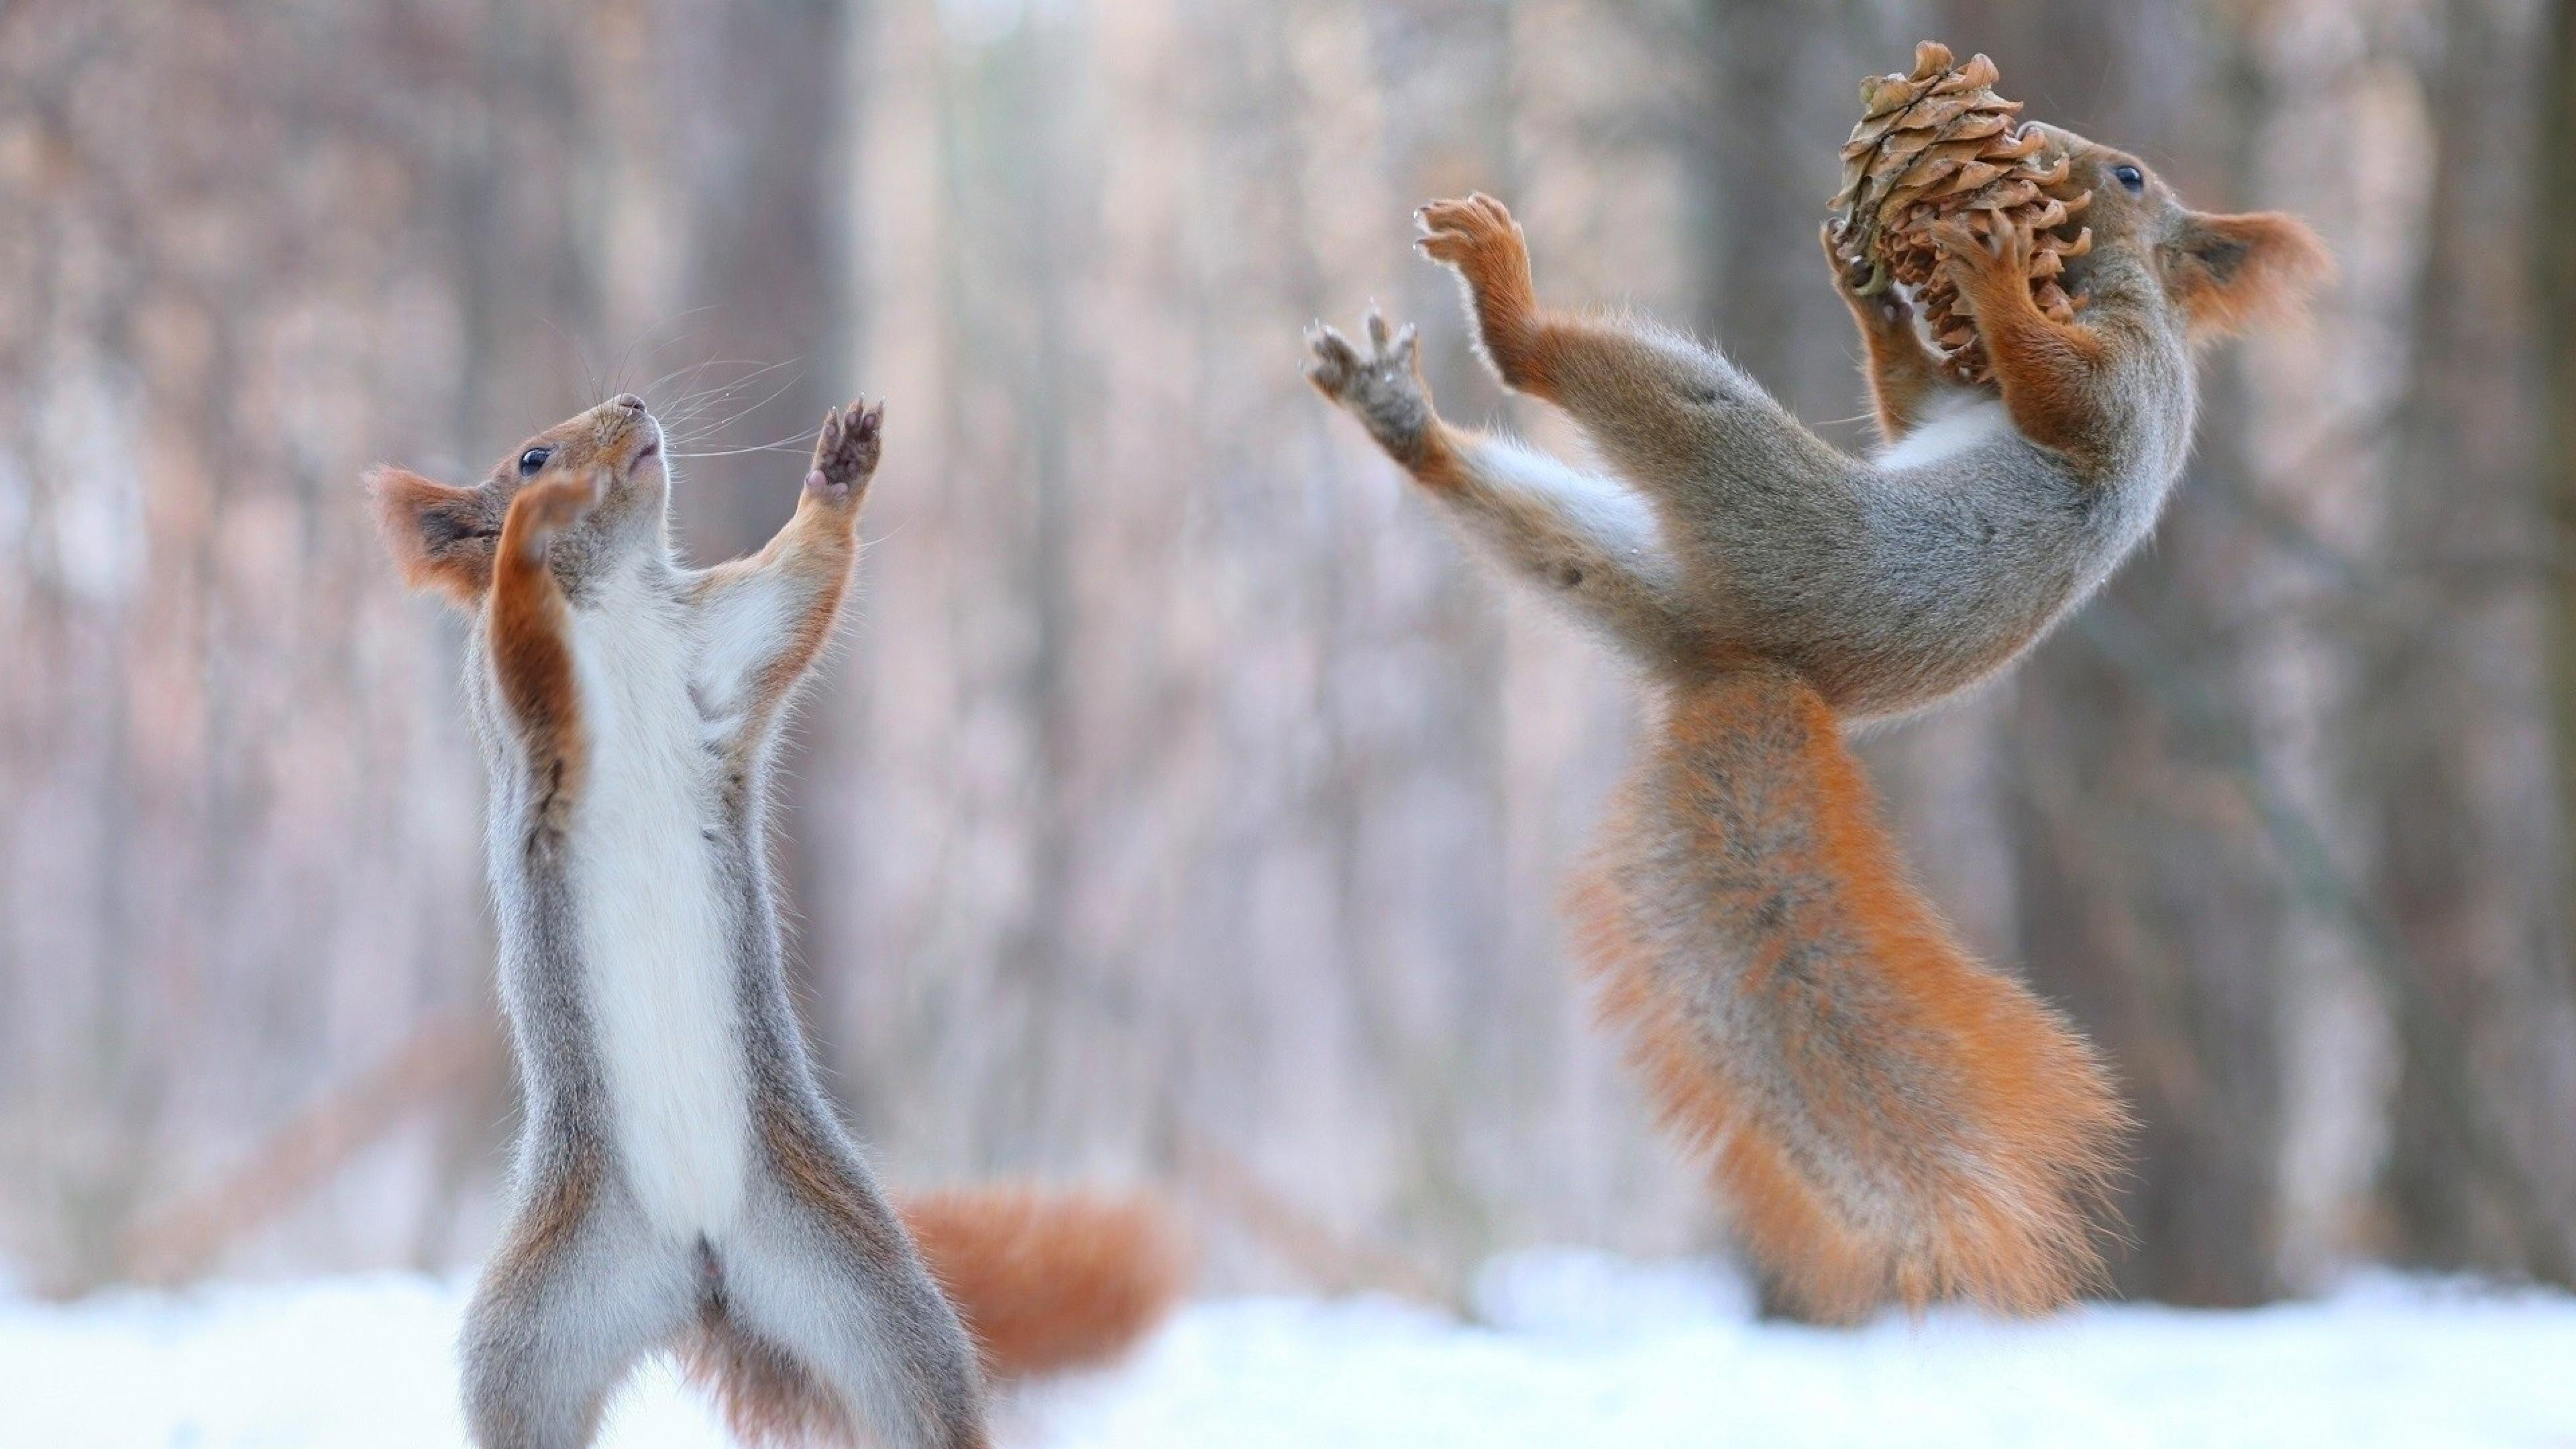 squirrels having fun in snow 1575663191 - Squirrels Having Fun In Snow -